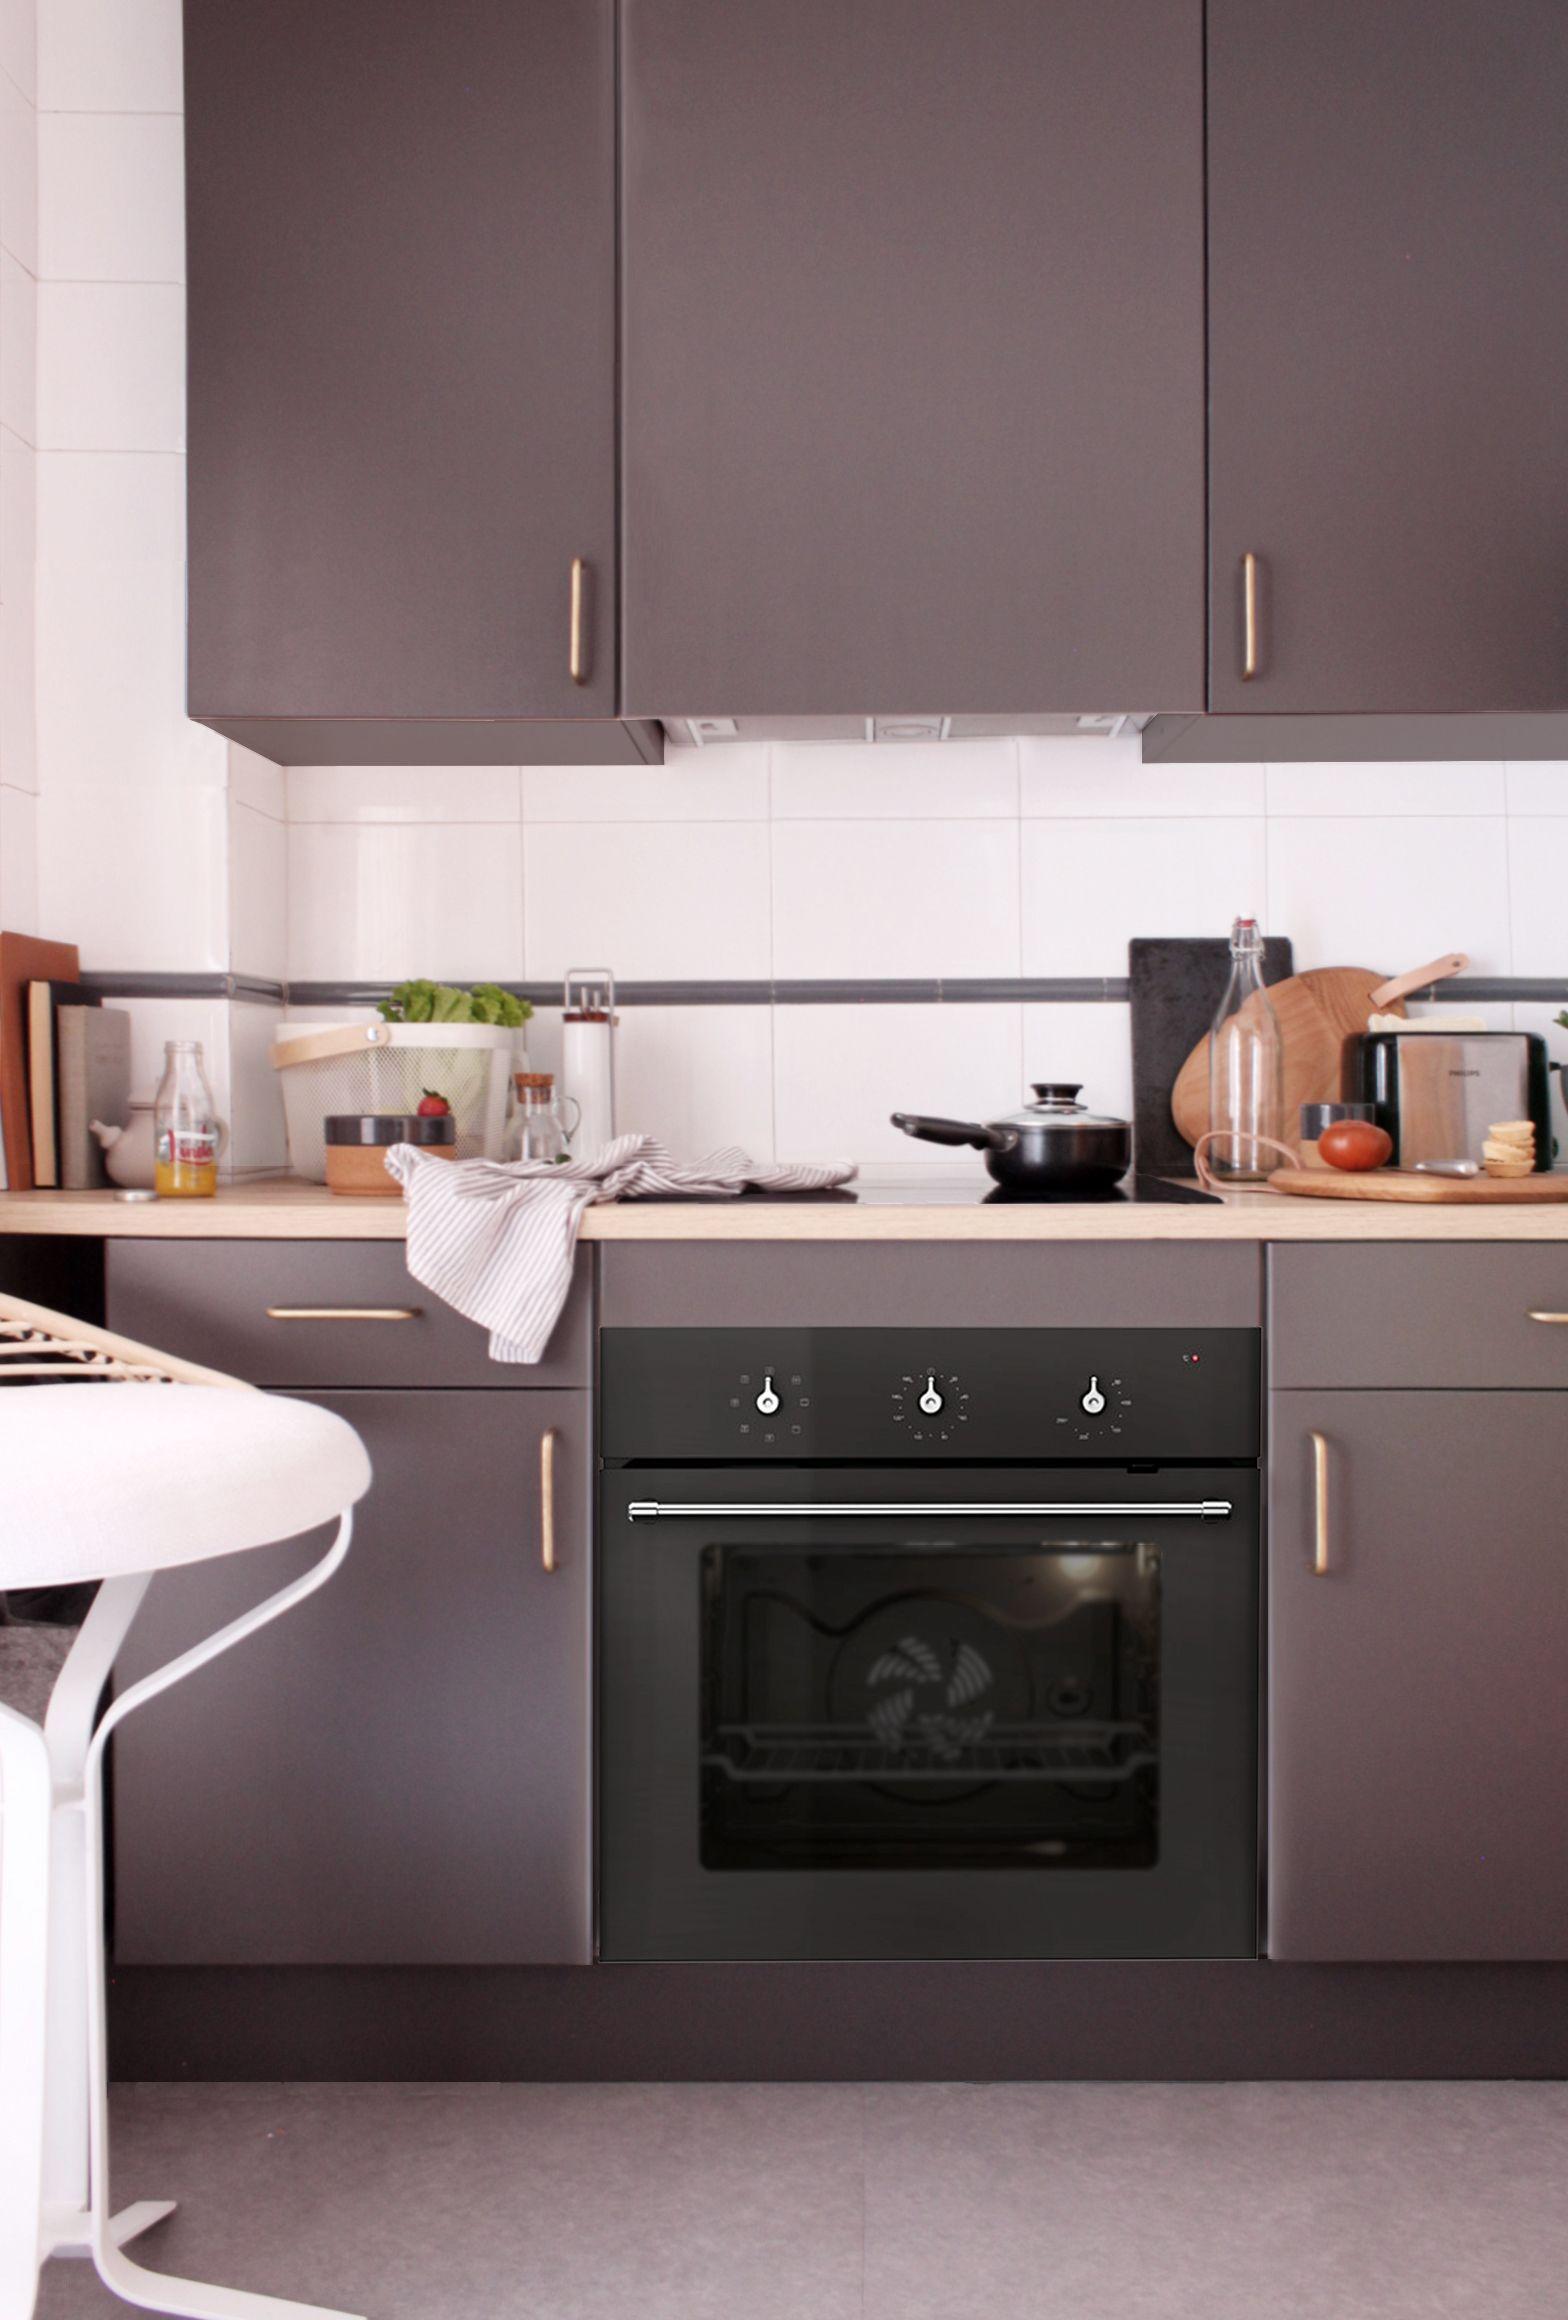 Dorable Cocina Blog De Diseño Regalo - Ideas de Decoración de Cocina ...